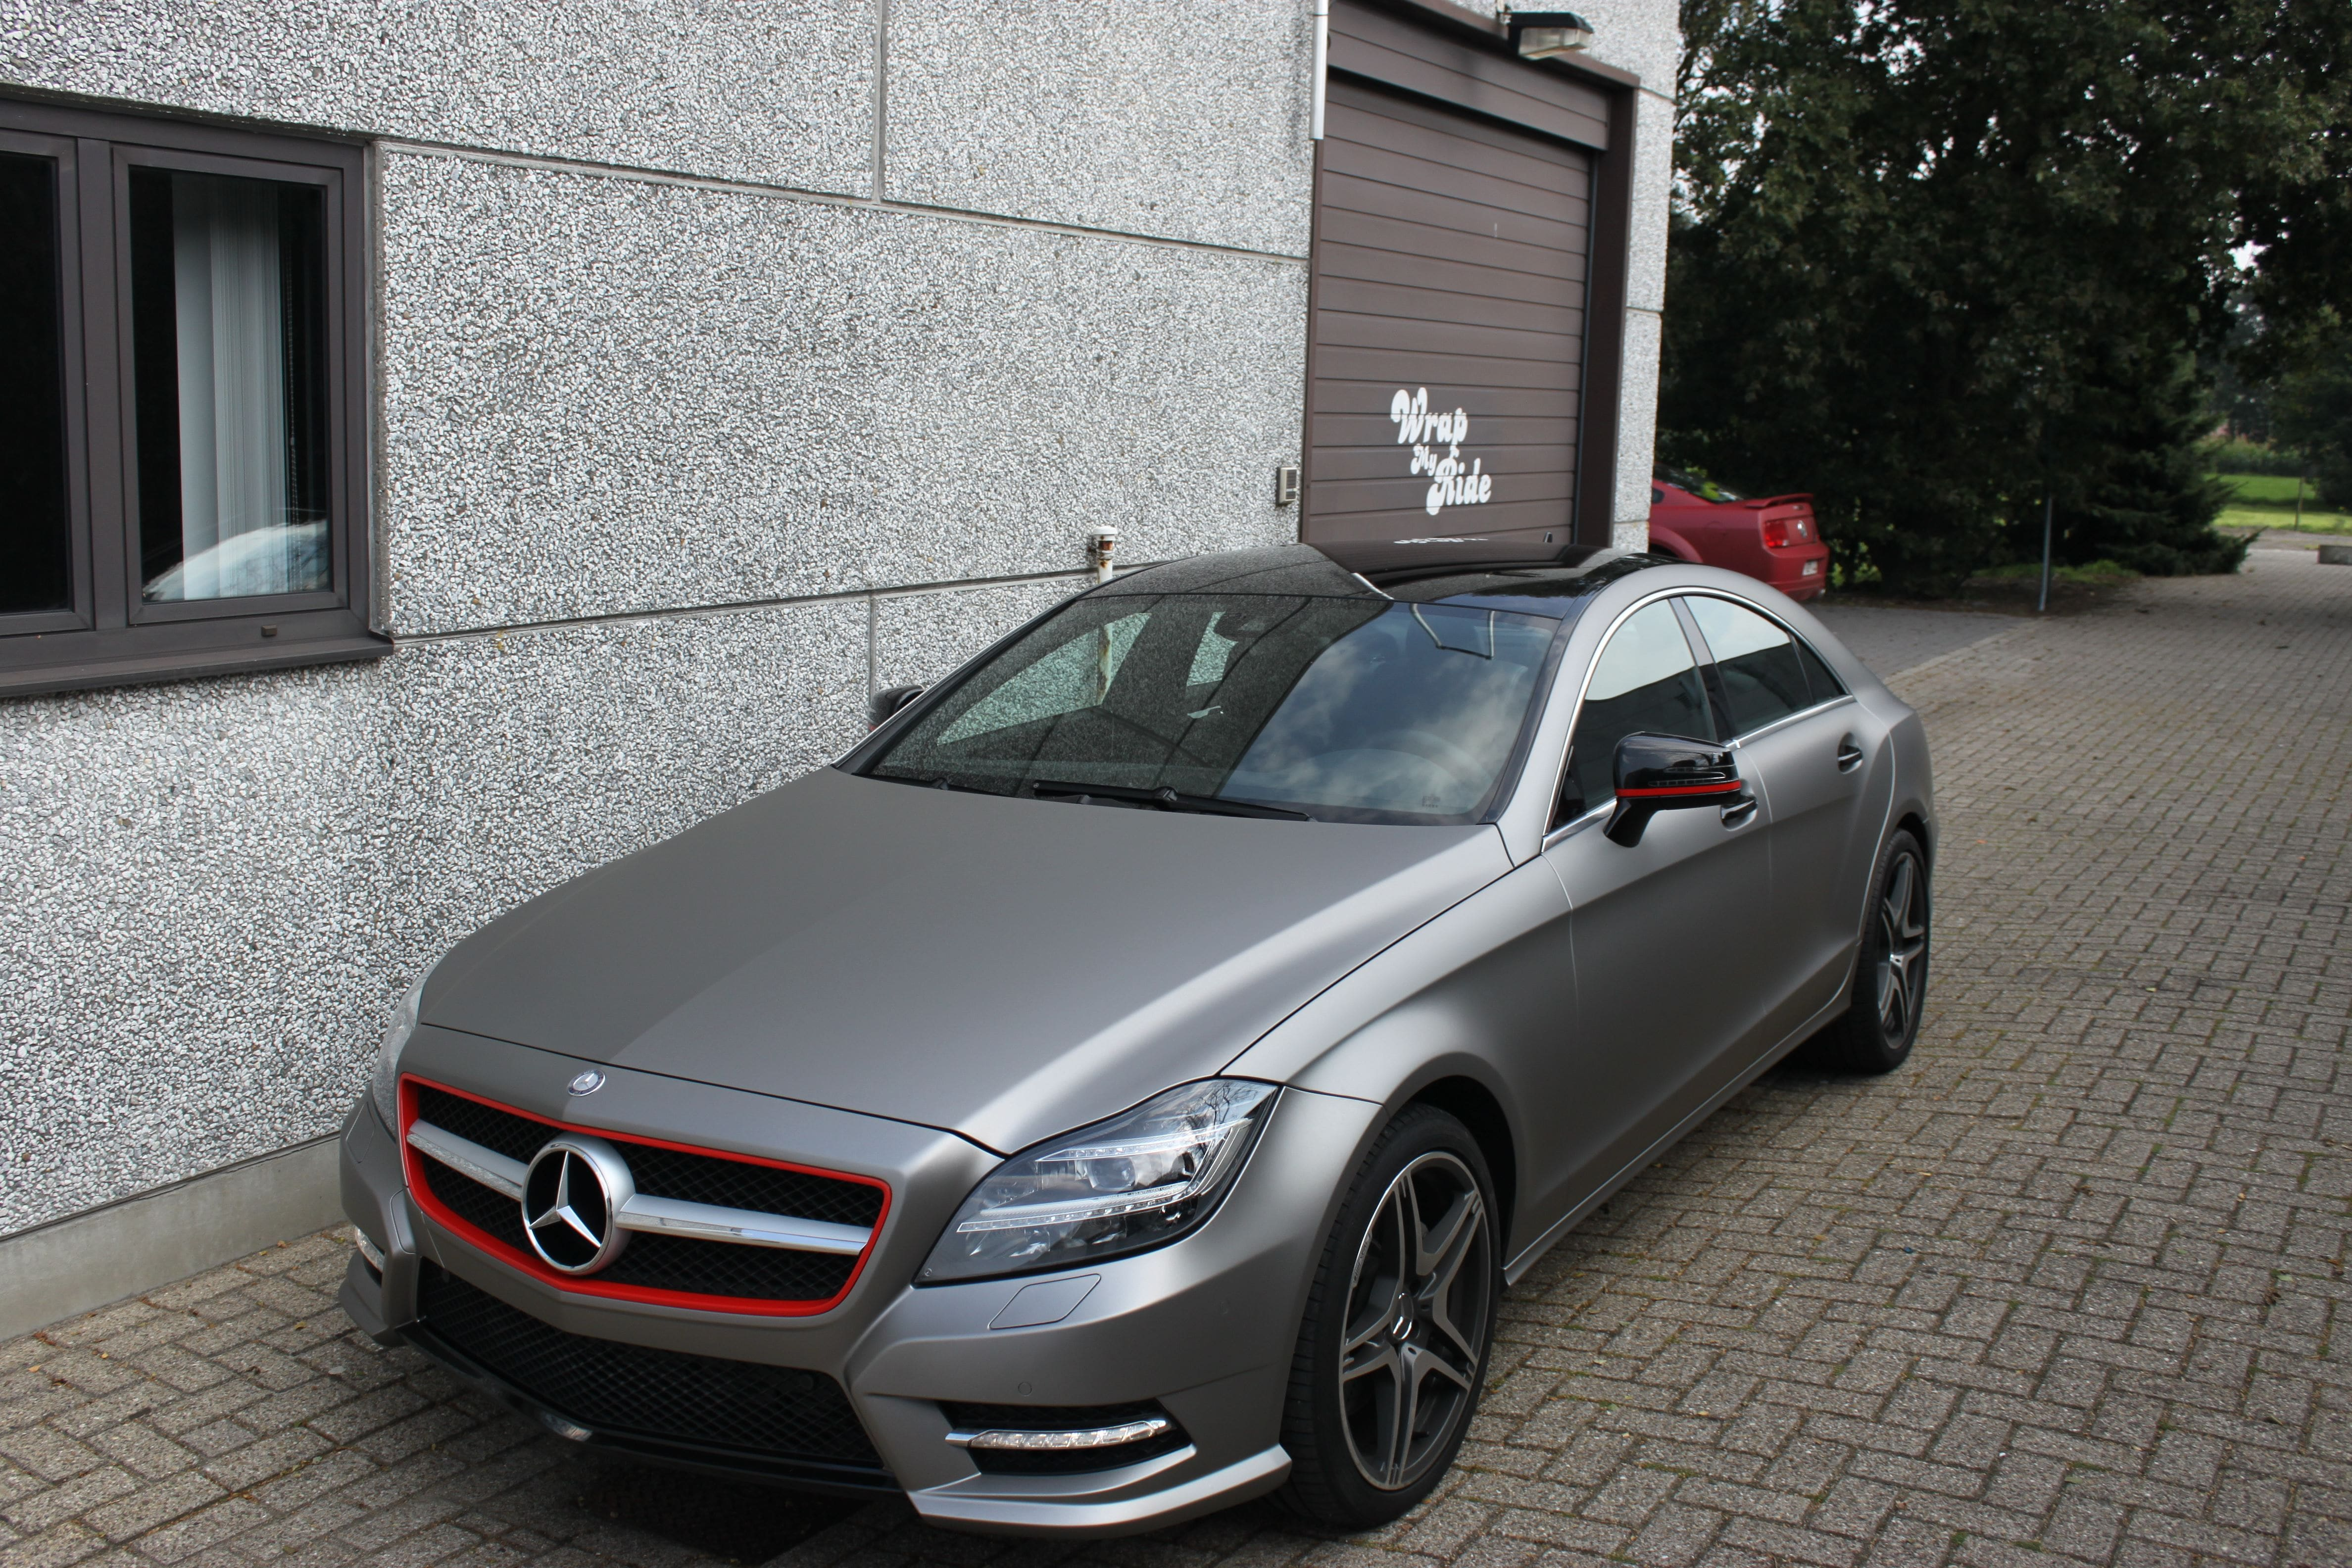 Mercedes CLS met Mat Grey Aluminium Wrap, Carwrapping door Wrapmyride.nu Foto-nr:6147, ©2020